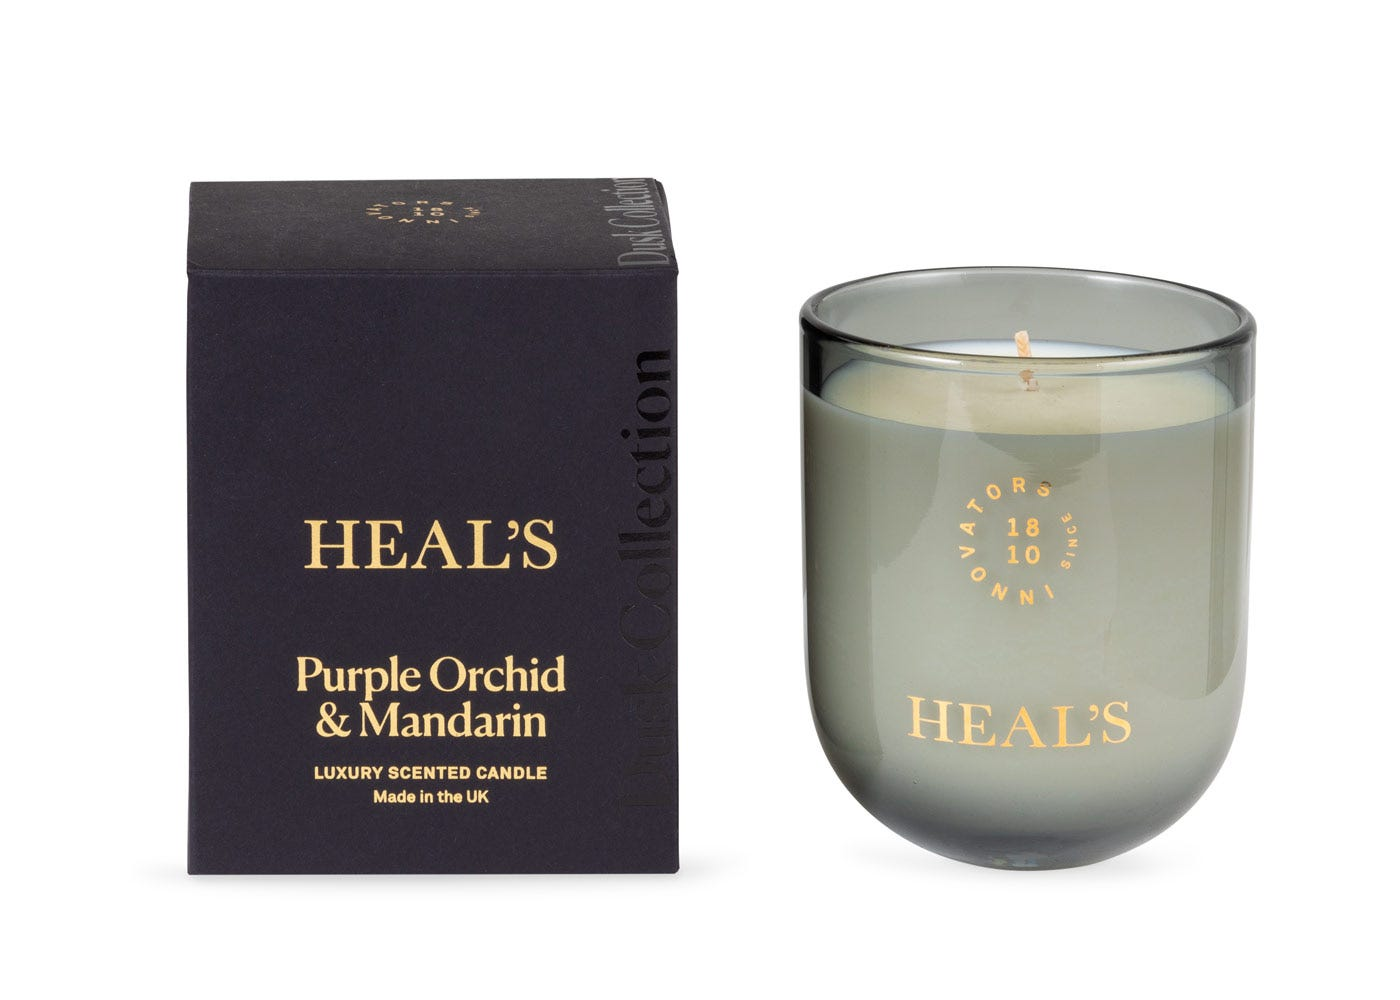 Heal's Purple Orchid & Mandarin Dusk Candle